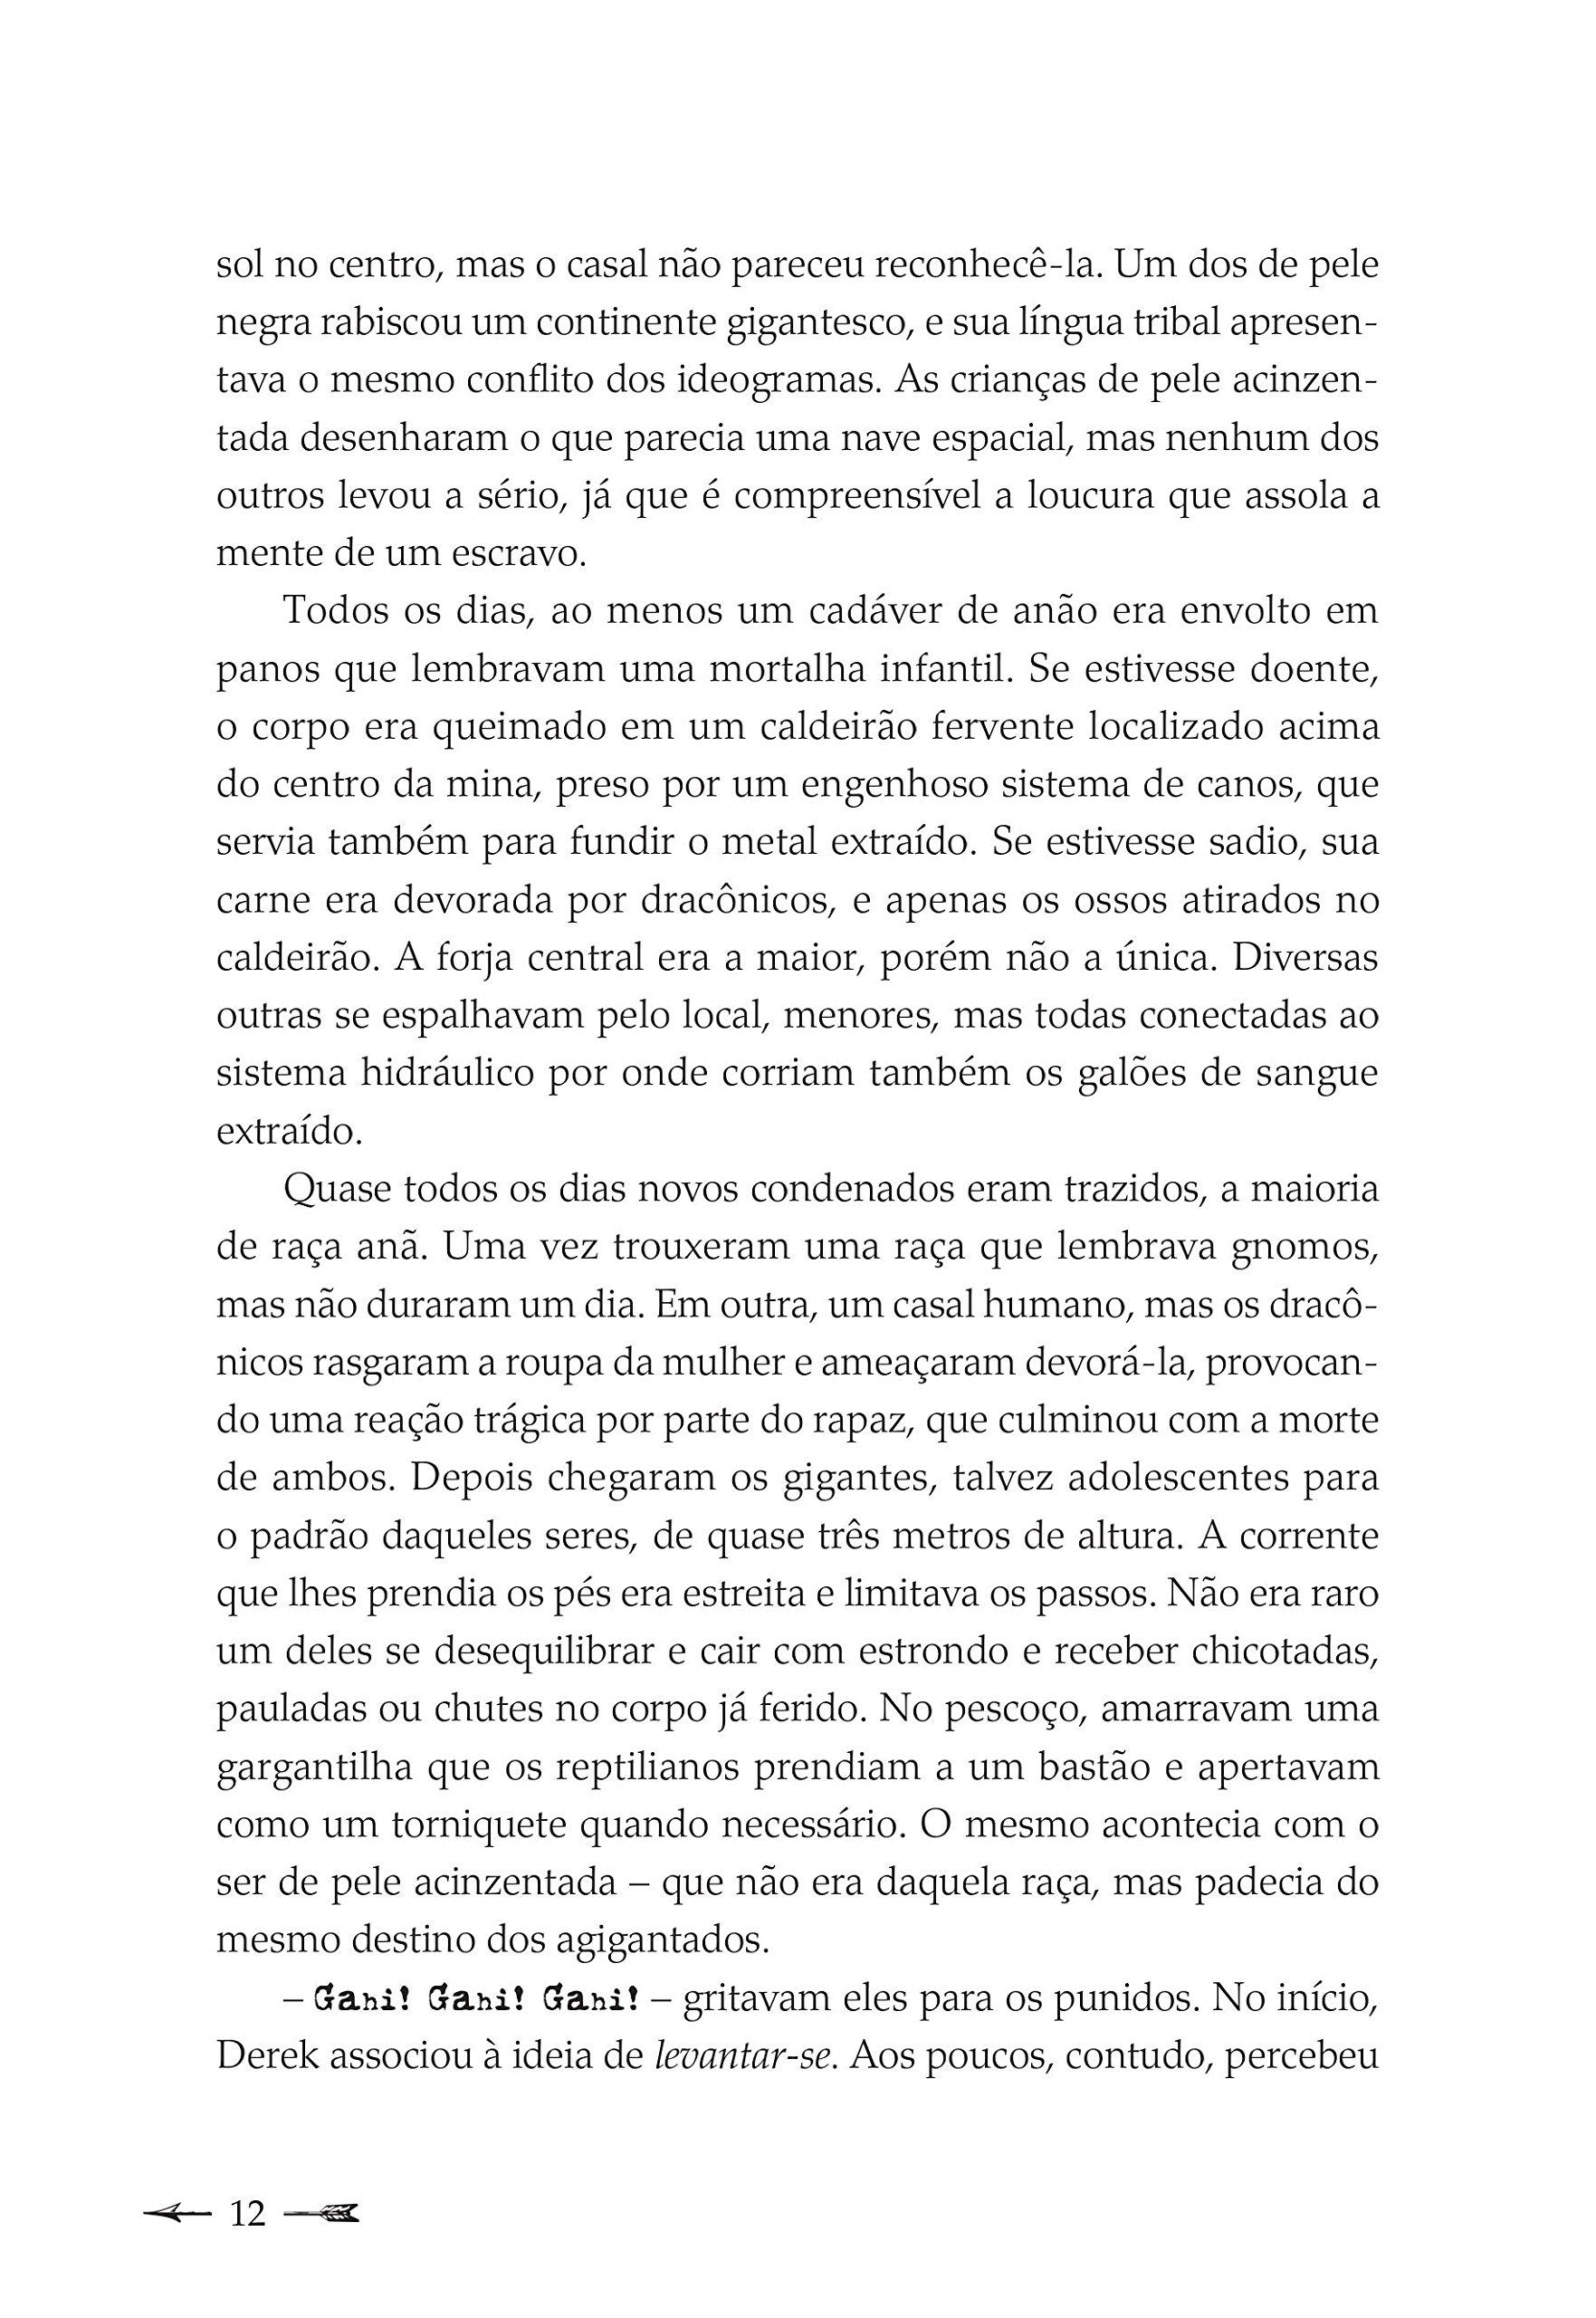 Cemitrio de drages volume 1 9788568263013 livros na amazon cemitrio de drages volume 1 9788568263013 livros na amazon brasil fandeluxe Image collections